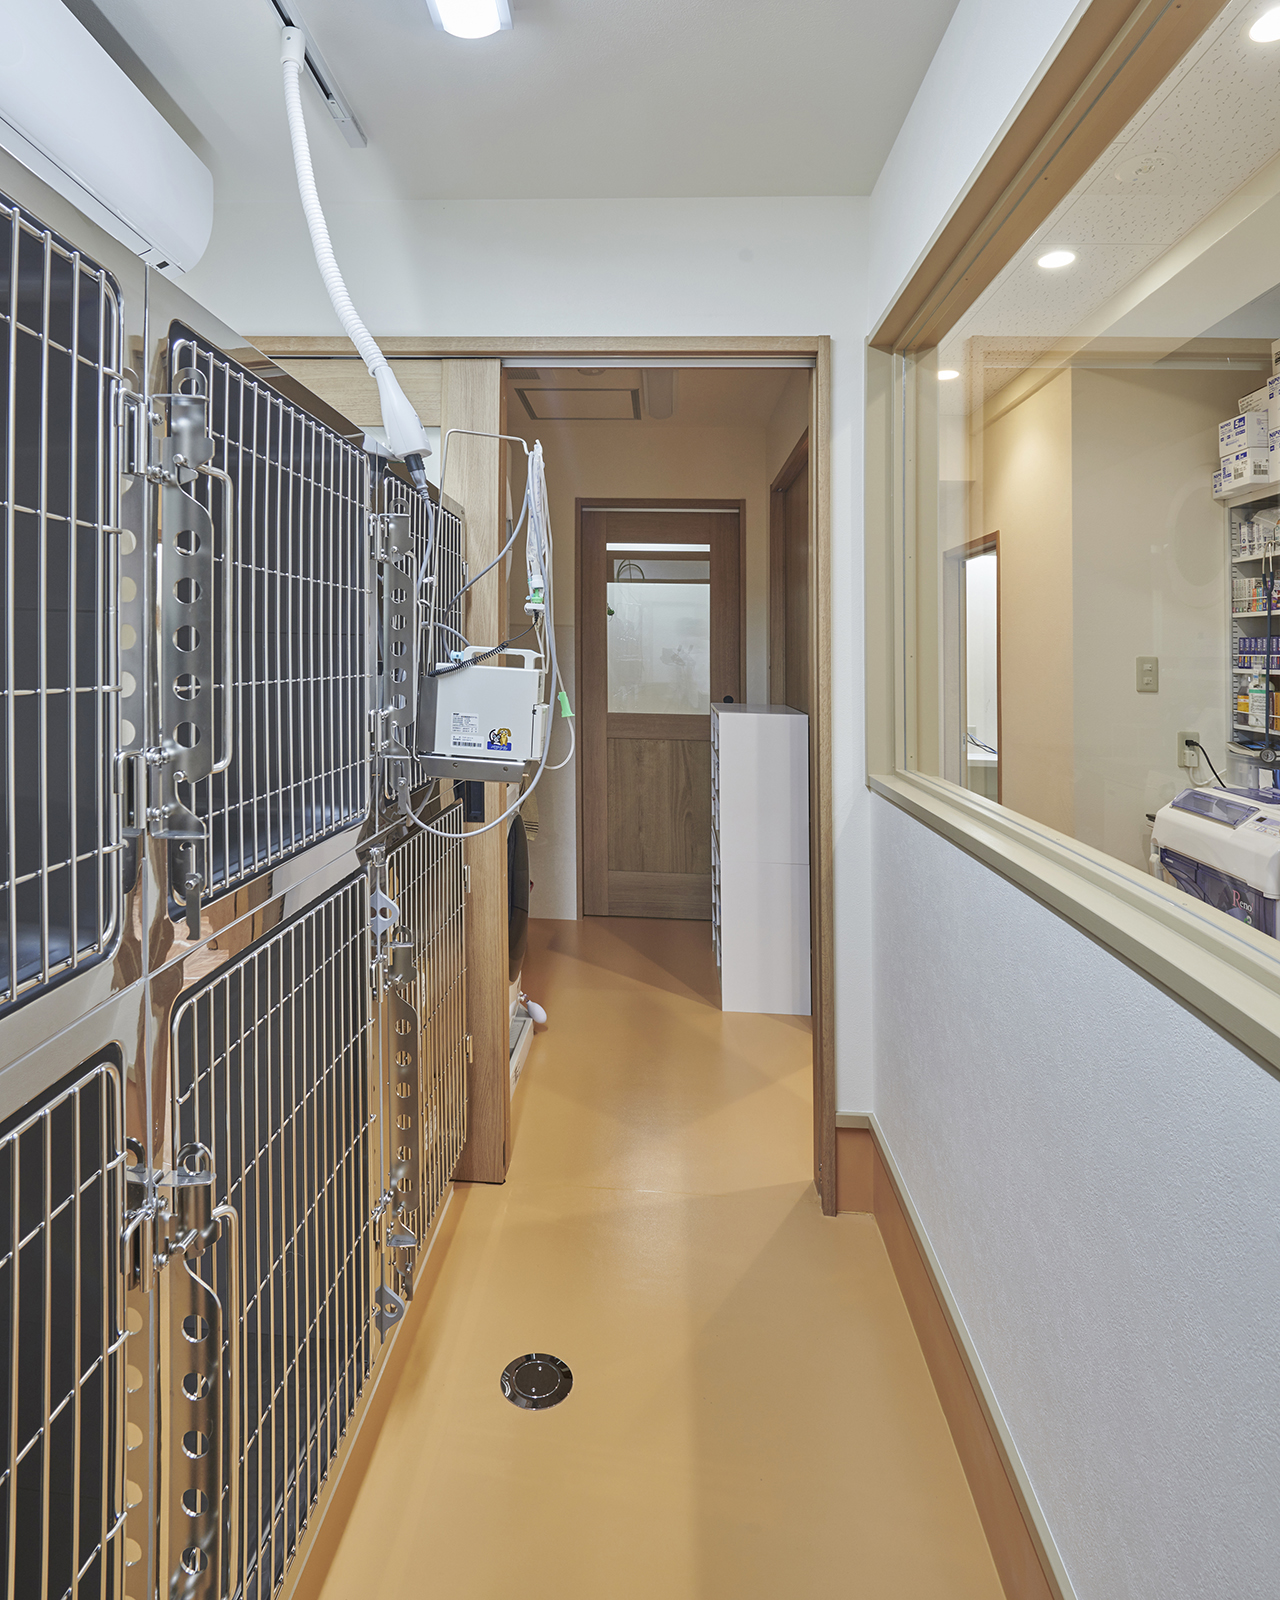 dog_hospitalization-room